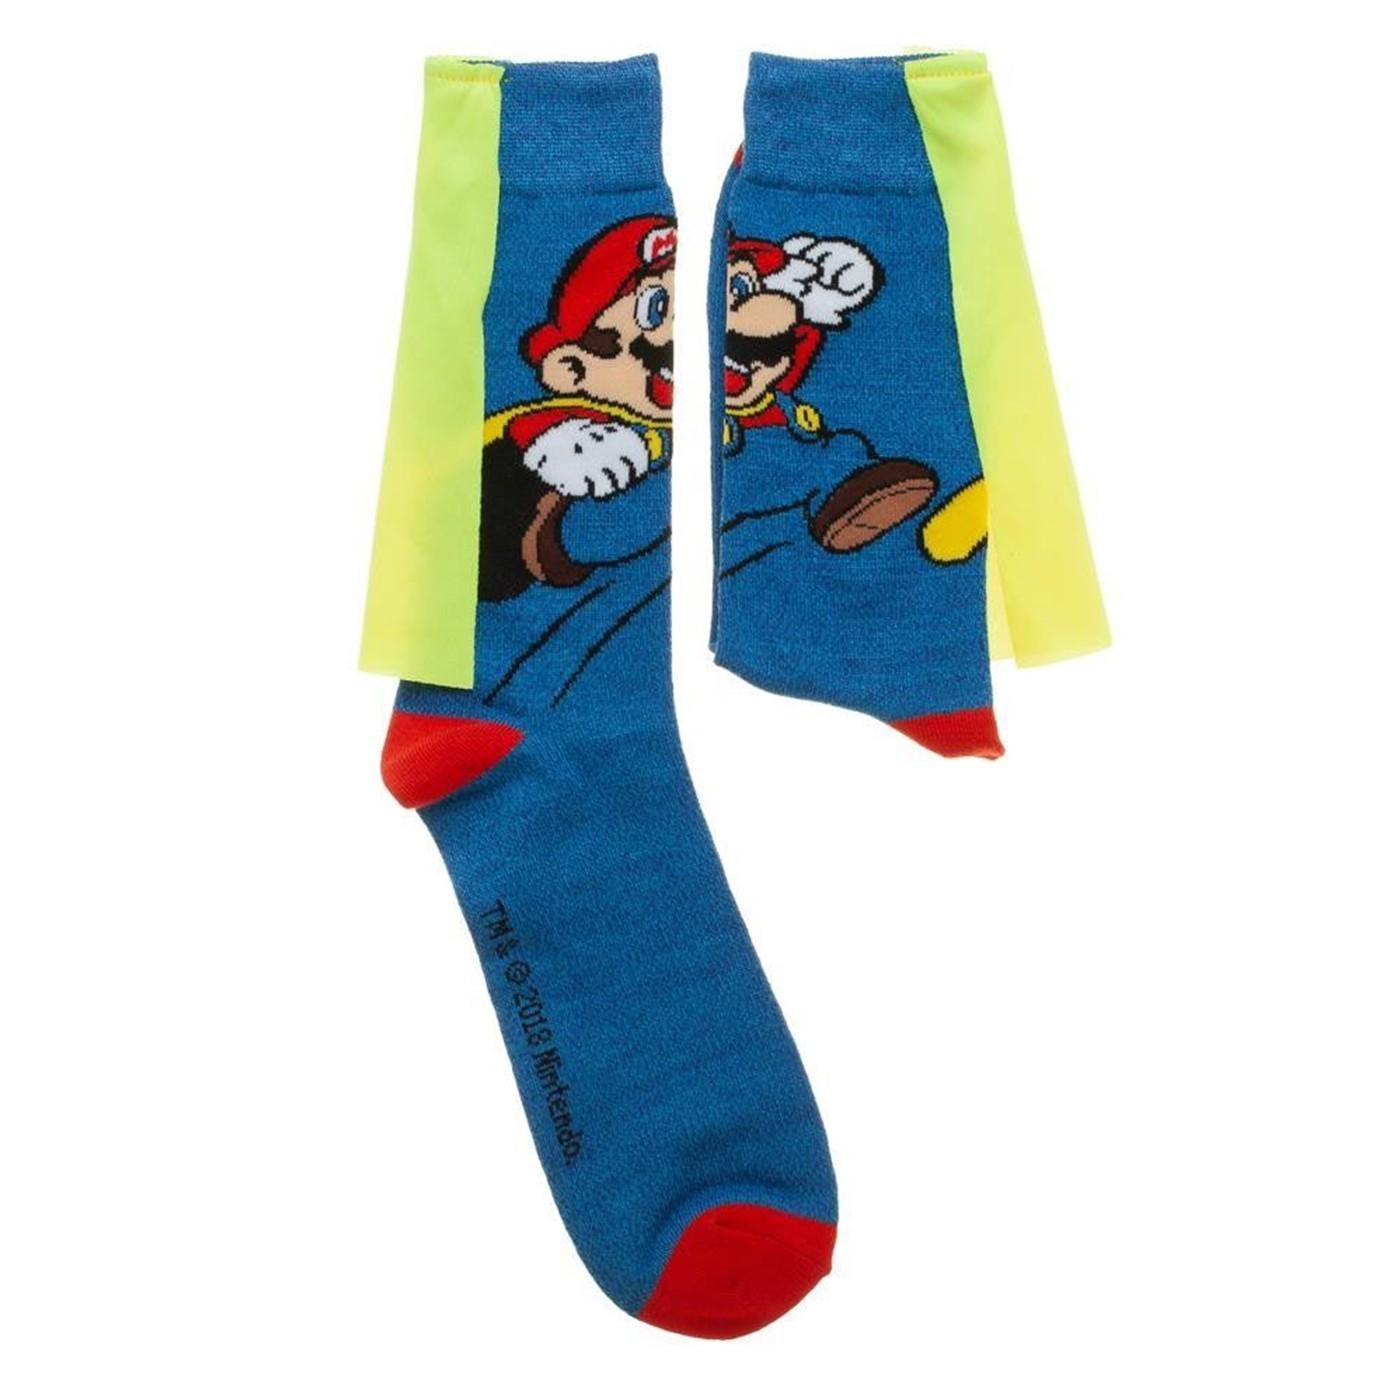 Nintendo Super Mario Brothers Caped Socks